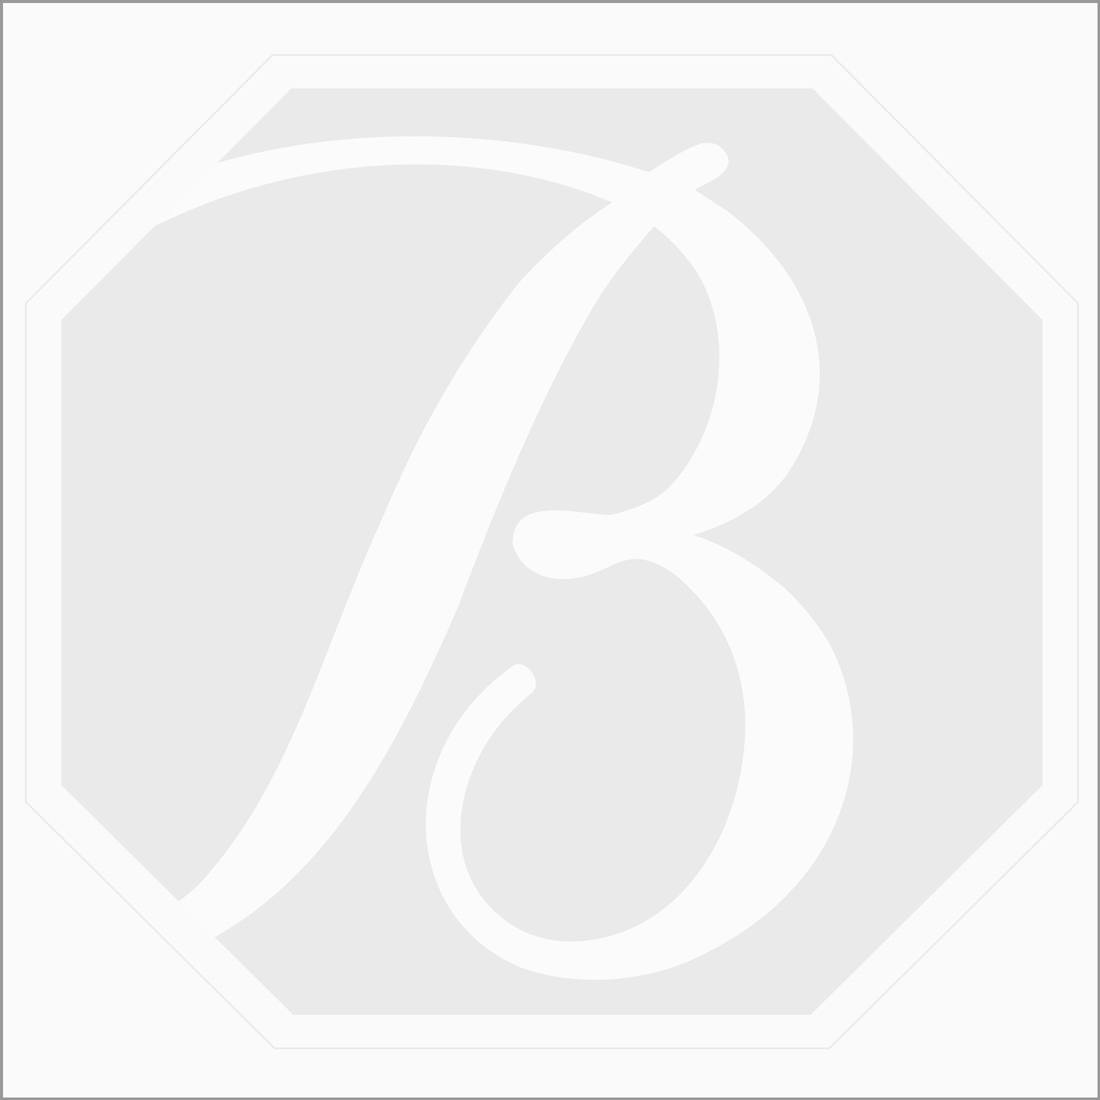 1 Black Diamond Pear Shape Rose Cut Diamond - 18.84 cts. (DRC1272)